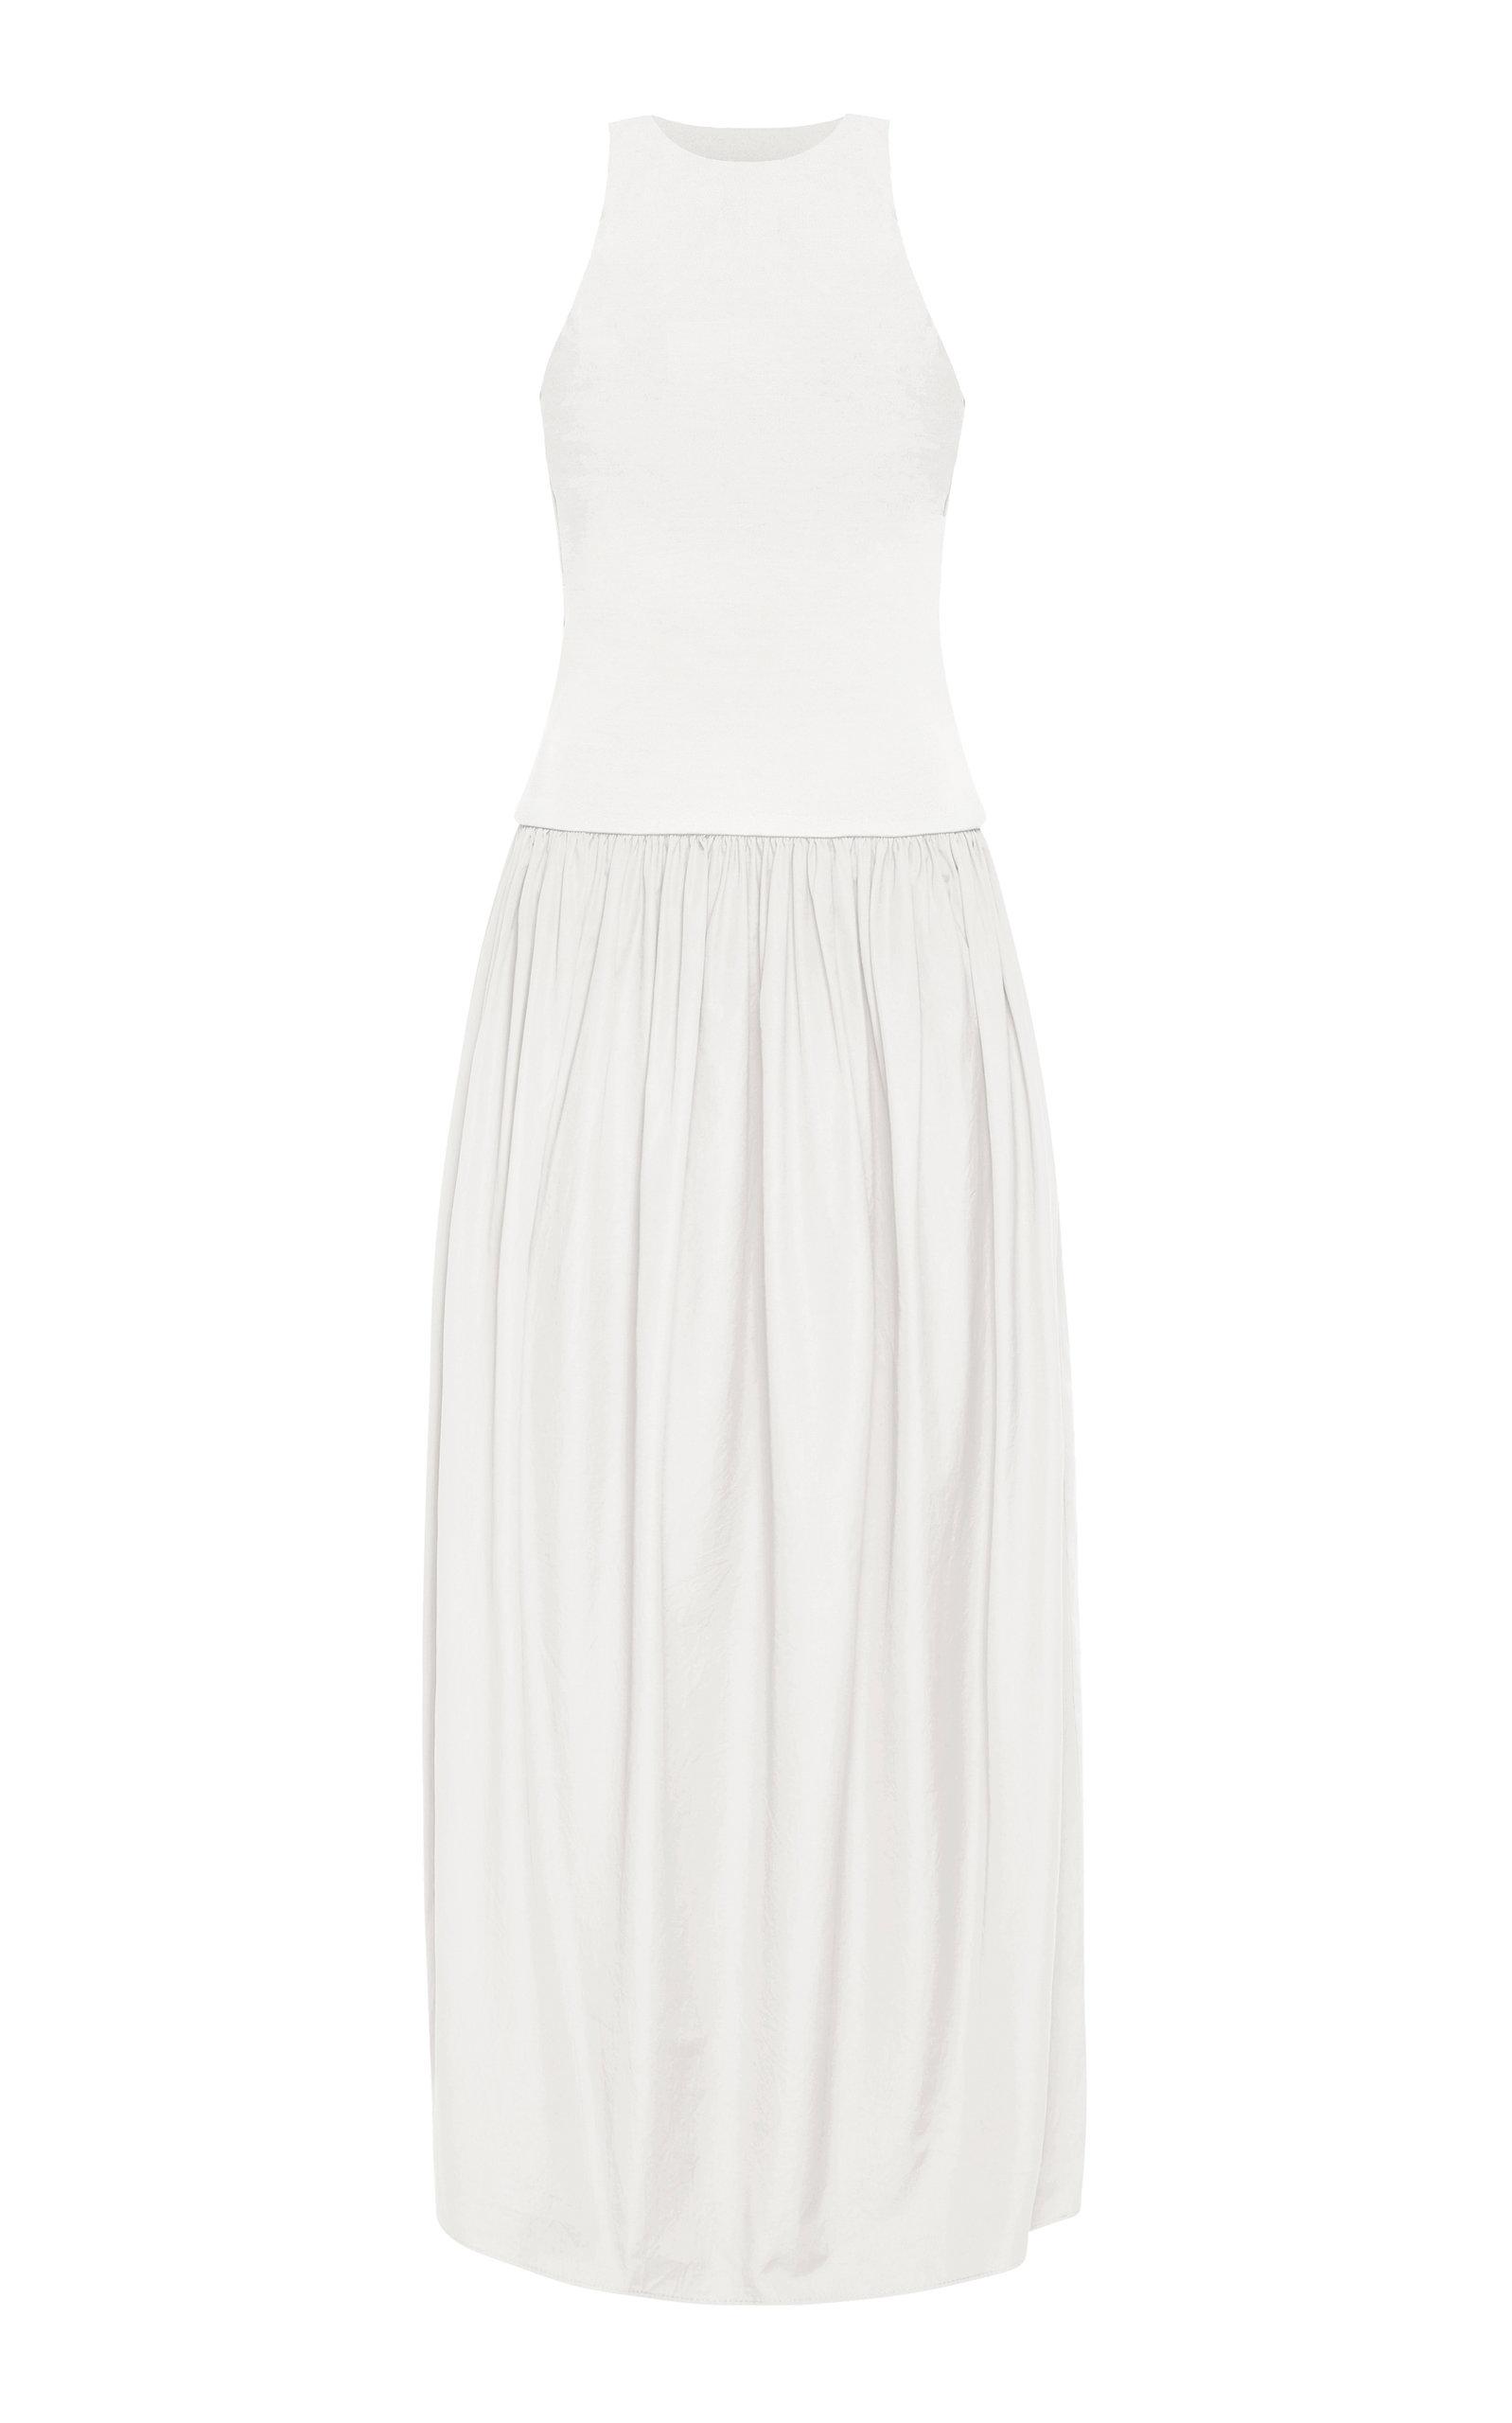 Women's Cotton Maxi Dress